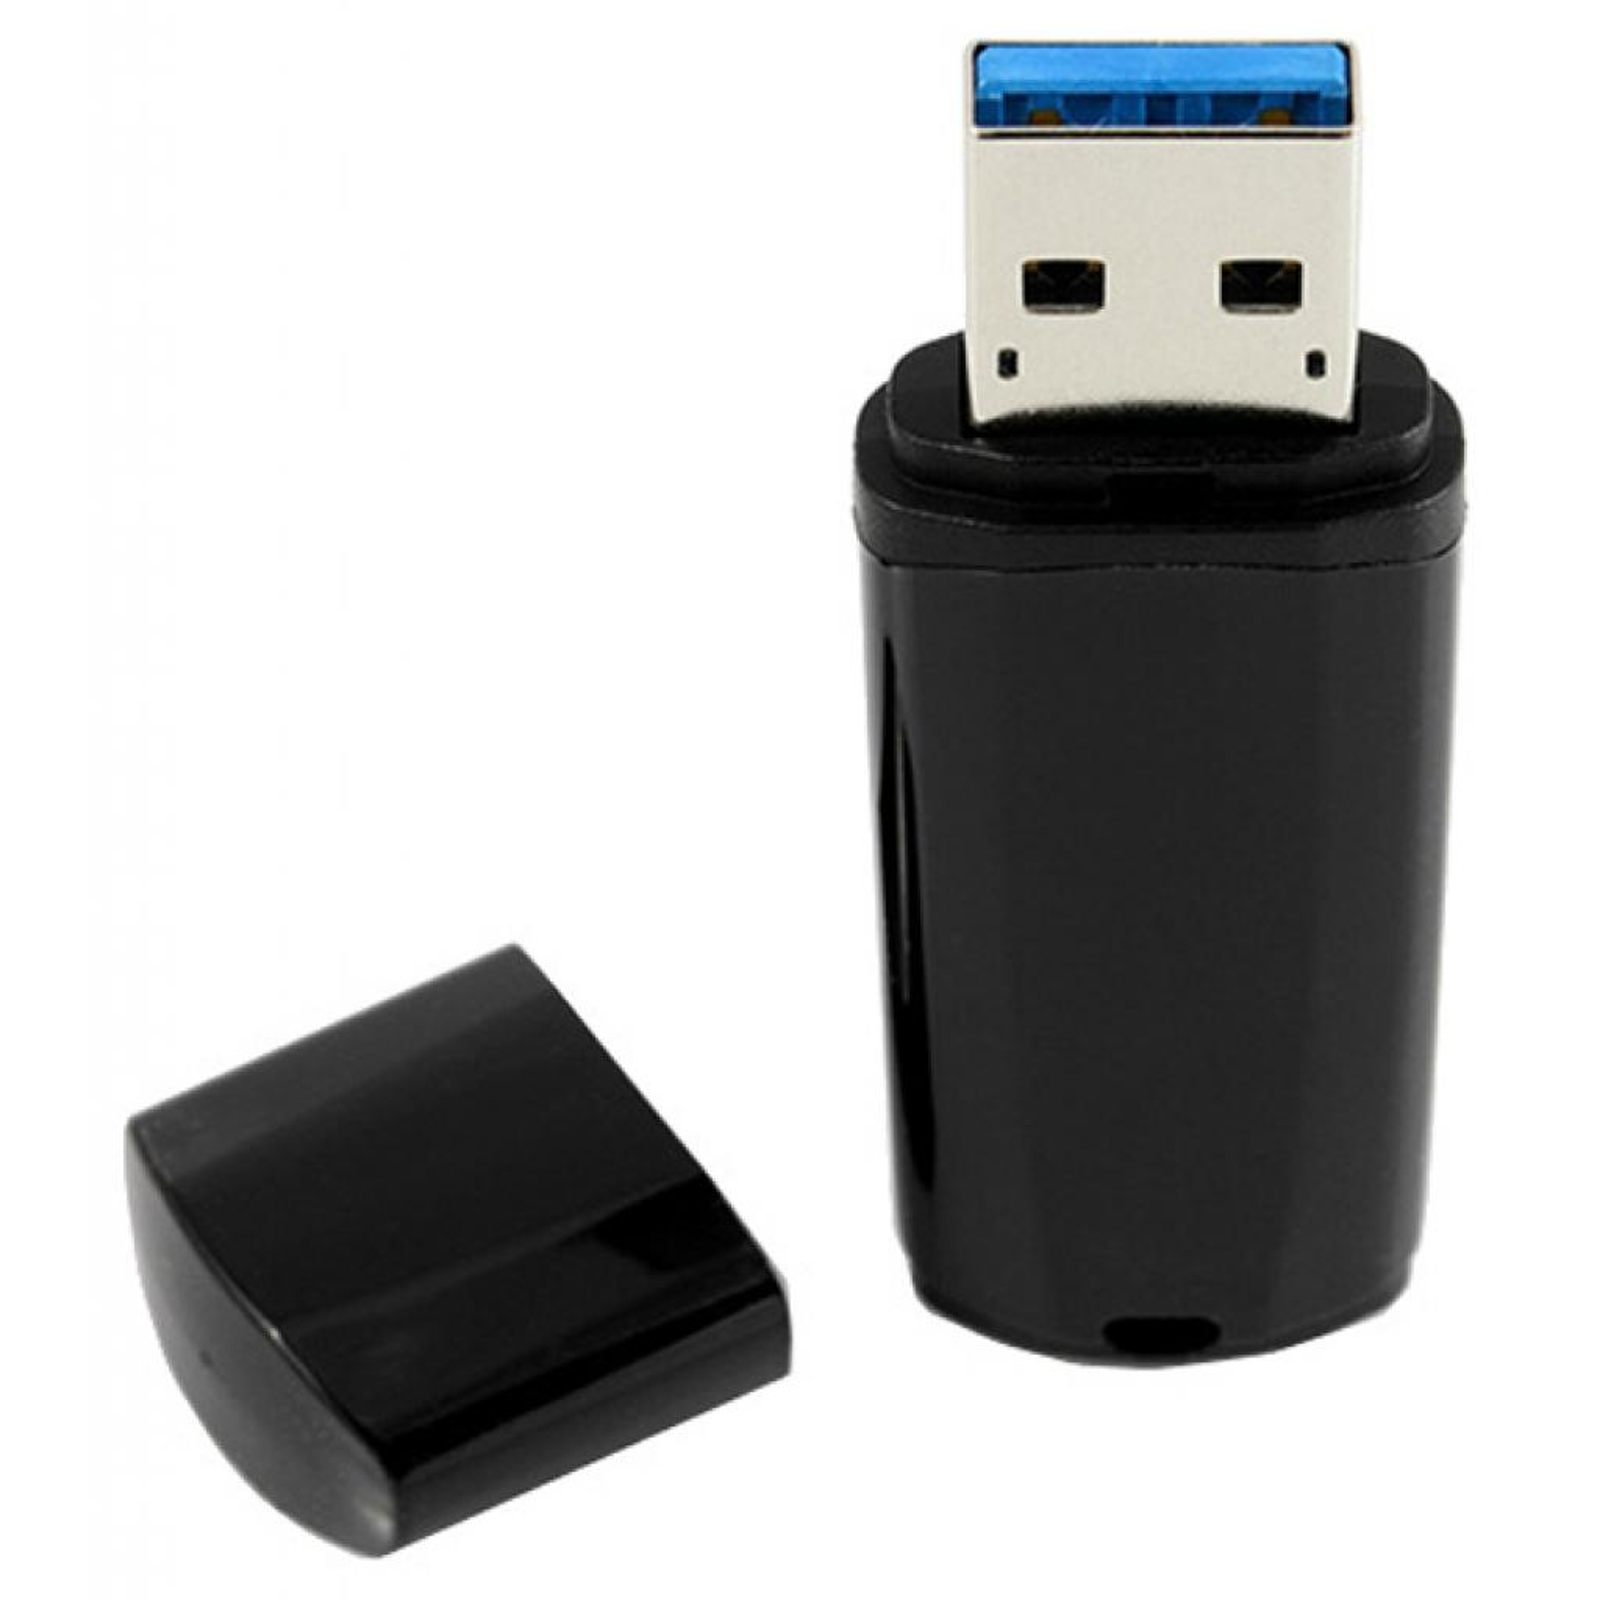 USB флеш накопитель GOODRAM 32GB Mimic Black USB 3.0 (UMM3-0320K0R11) изображение 3